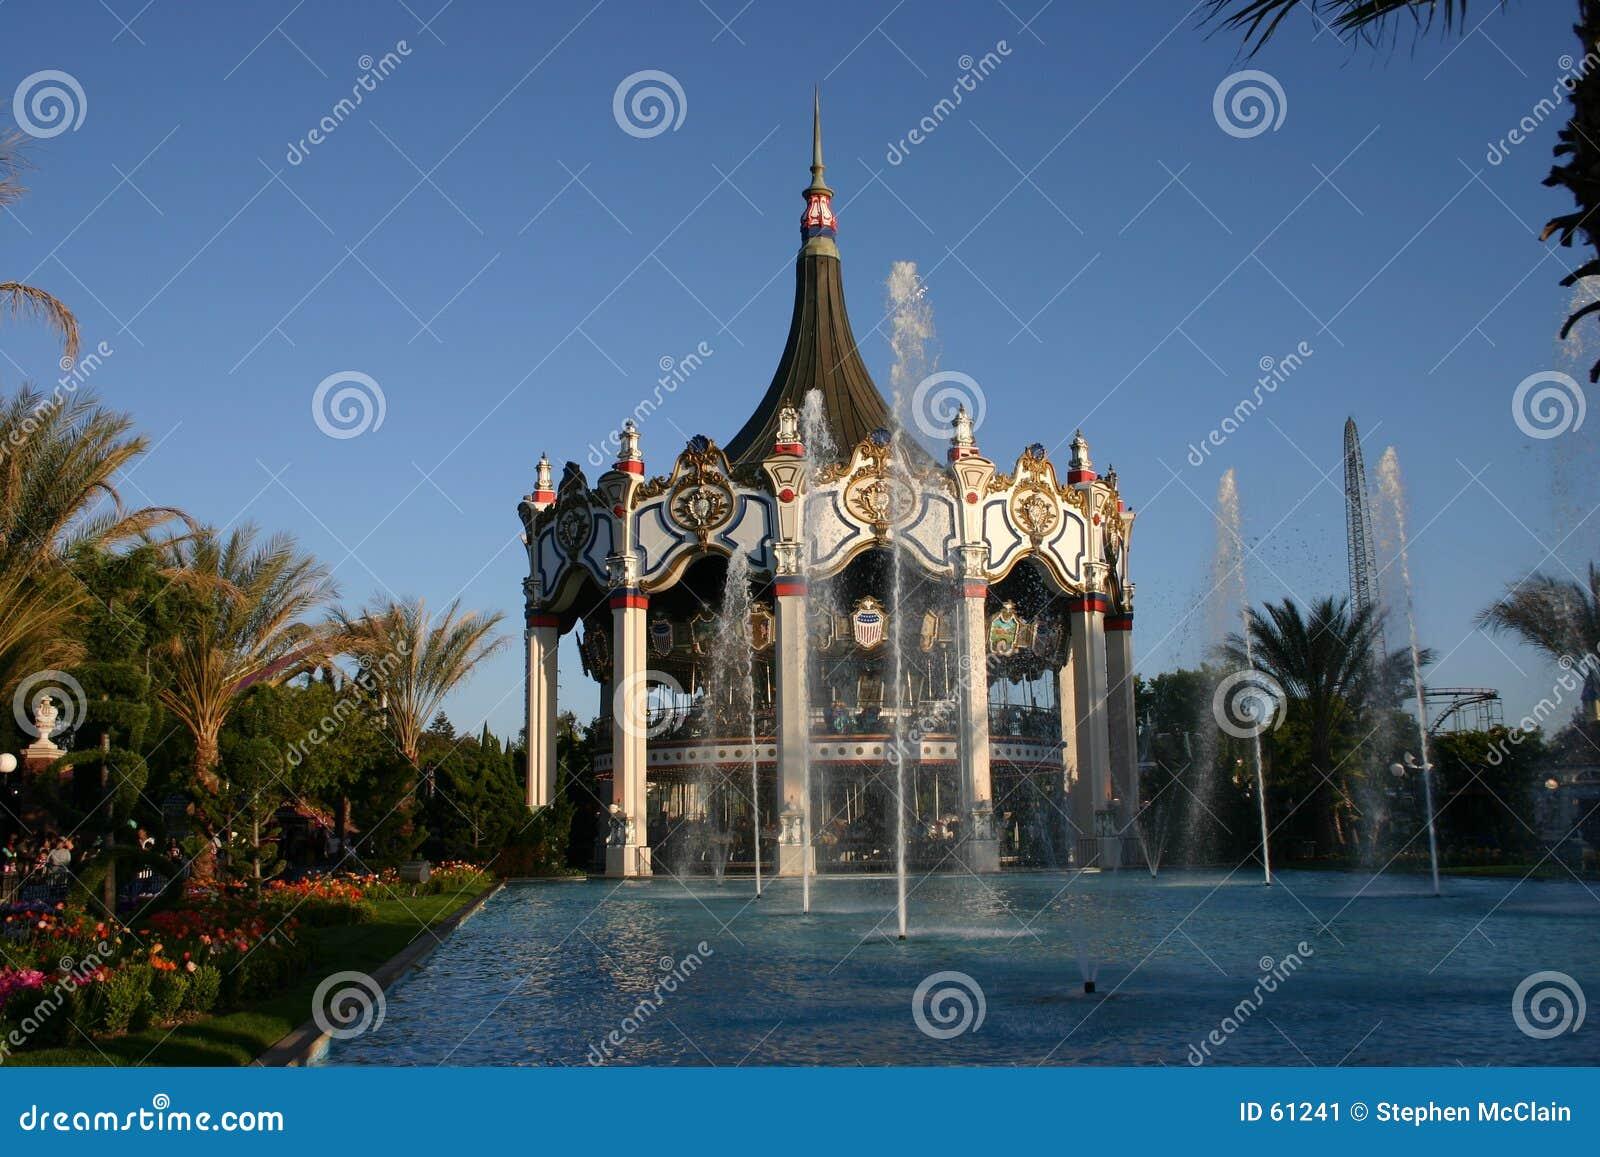 Carrousel bij Pretpark